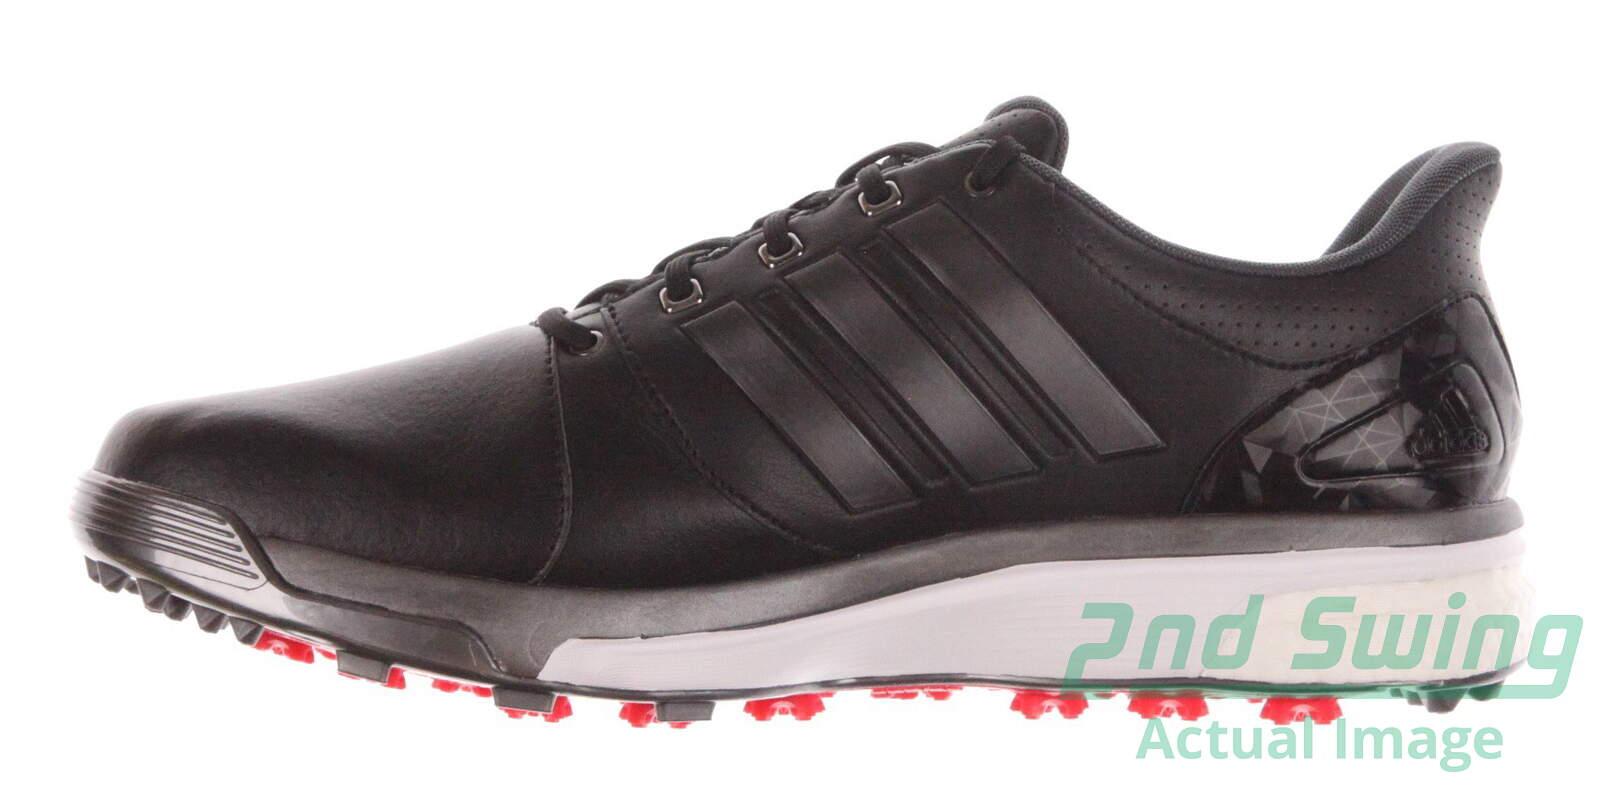 new arrivals e25fa 236a8 New Mens Golf Shoes Adidas Adipower Boost 2 Medium 11.5 Black MSRP 150  Q44660 - Golf Footwear  2nd Swing Golf